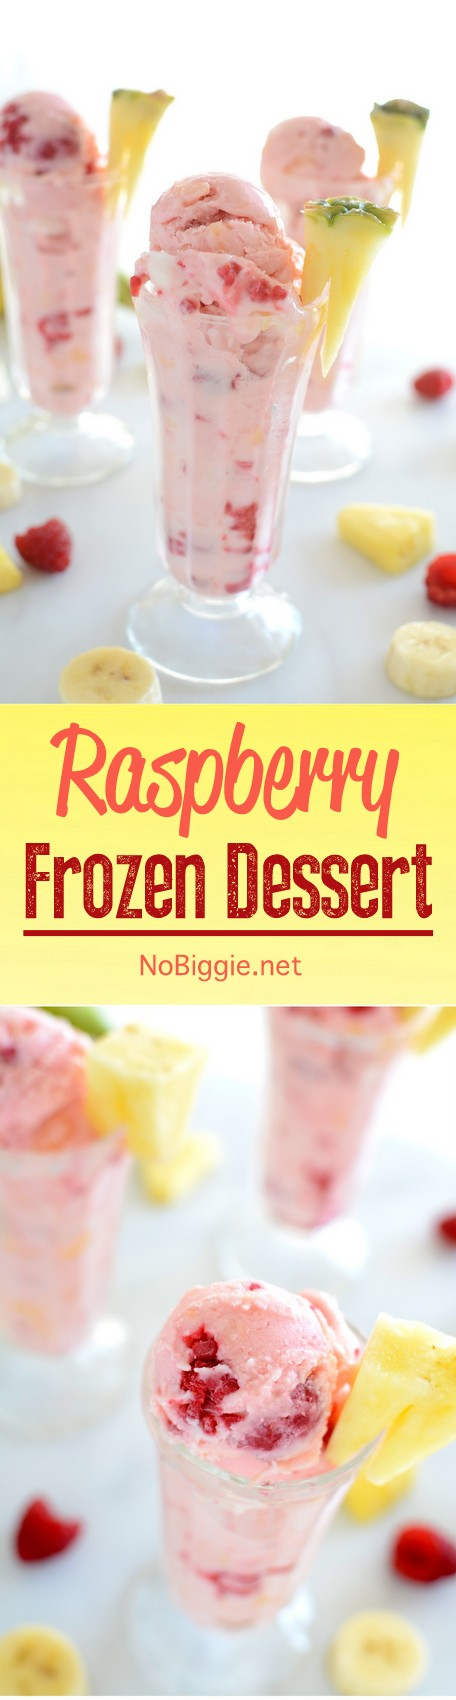 http://www.nobiggie.net/wp-content/uploads/2016/03/Raspberry-Frozen-Dessert.jpg